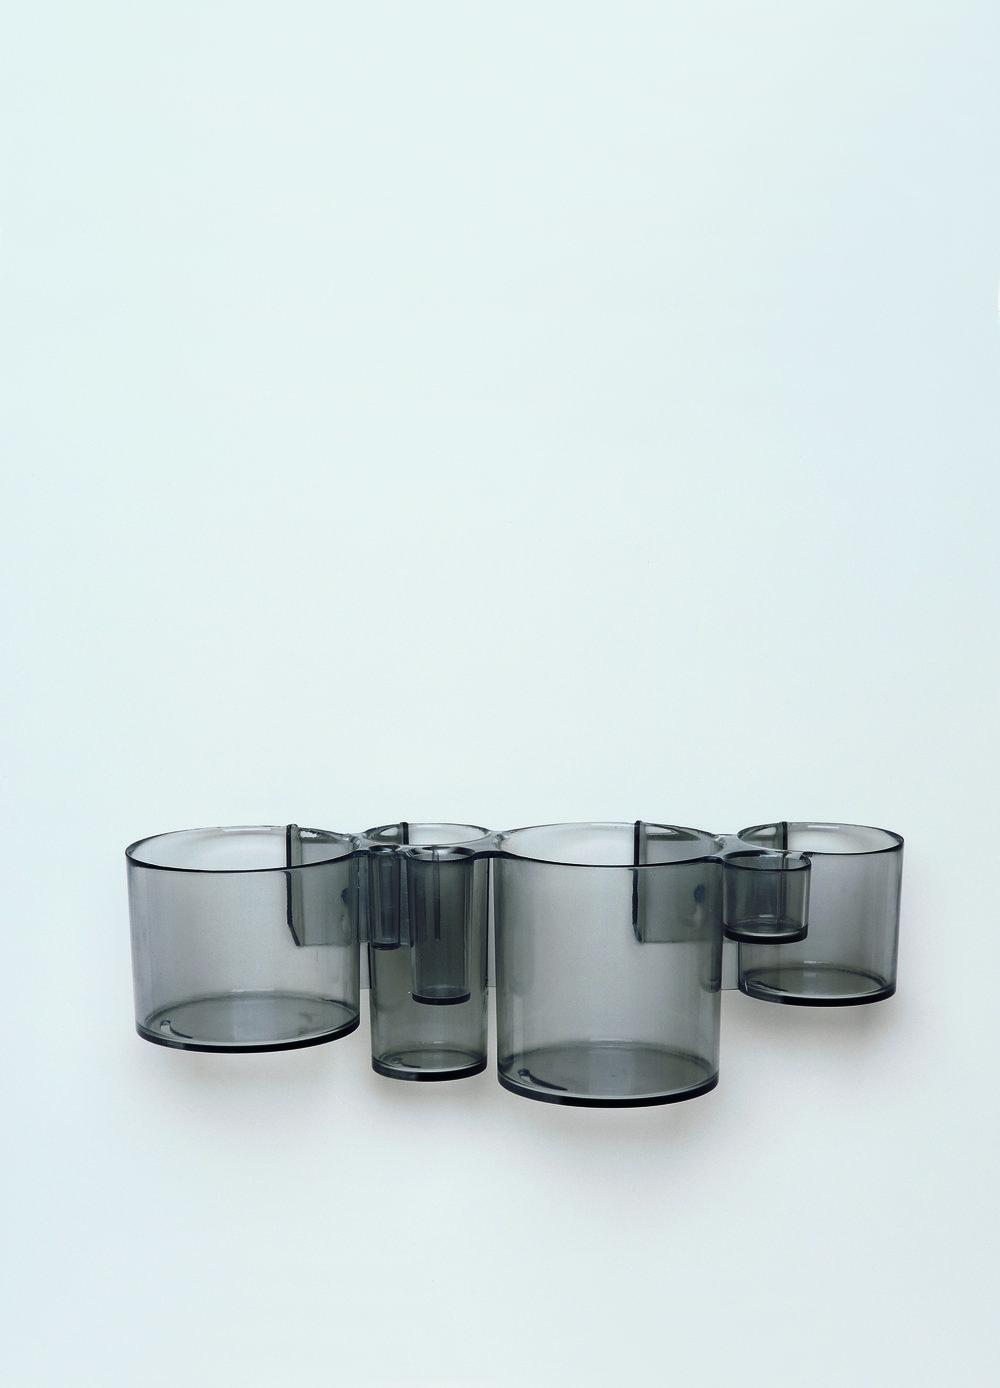 bsign-accesorios-productos-baño-bubble